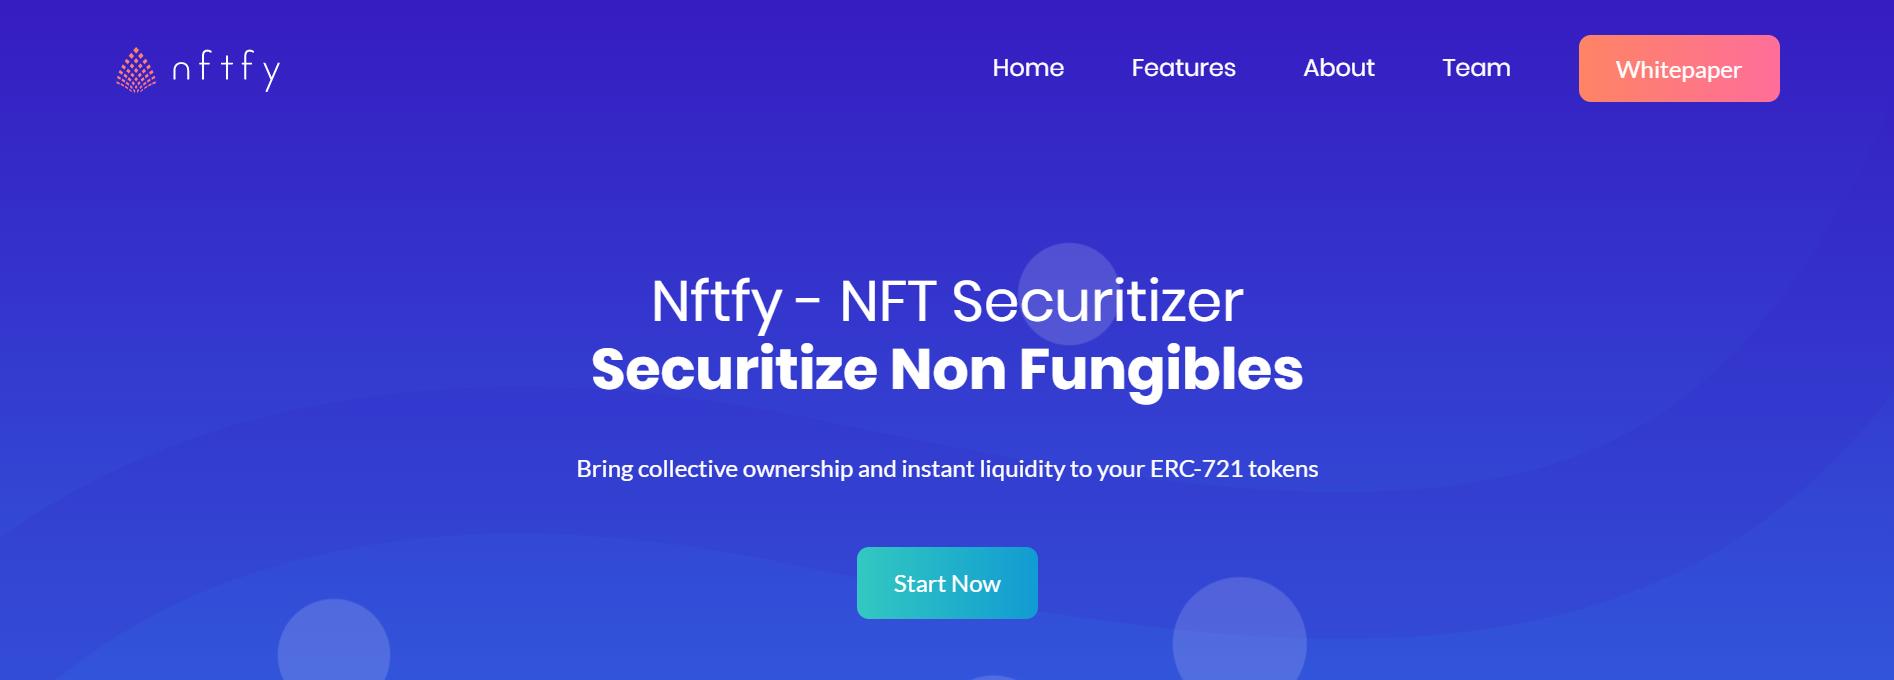 Nftfy showcase